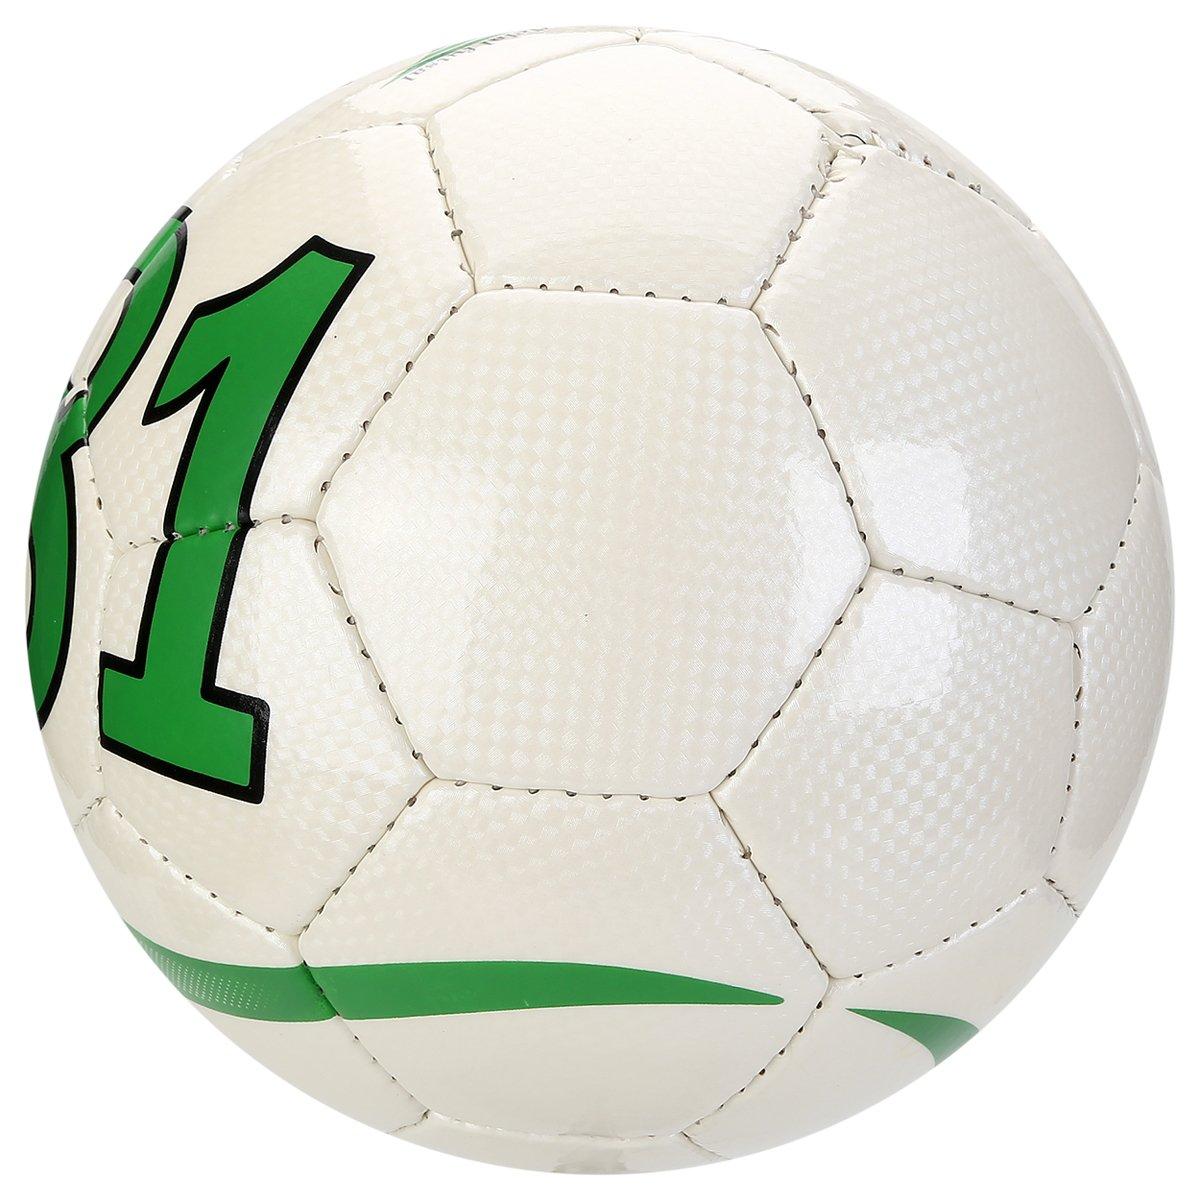 Bola Futebol Since 81 Celebration Colors Futsal - Compre Agora ... ec81a30af9318